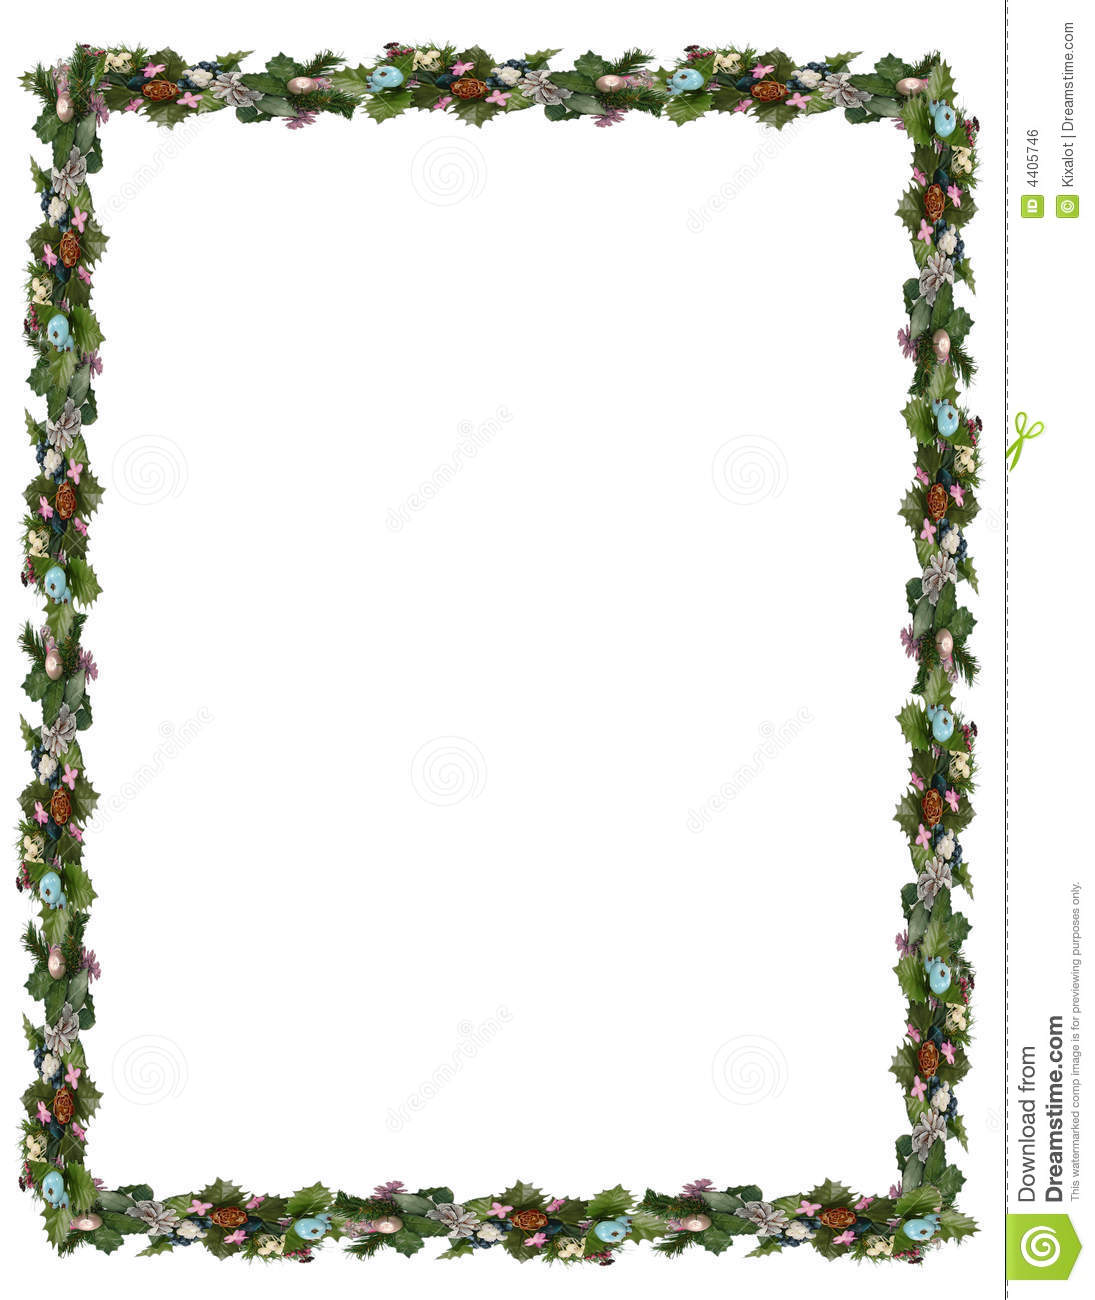 1095x1300 Christmas Border Clipart